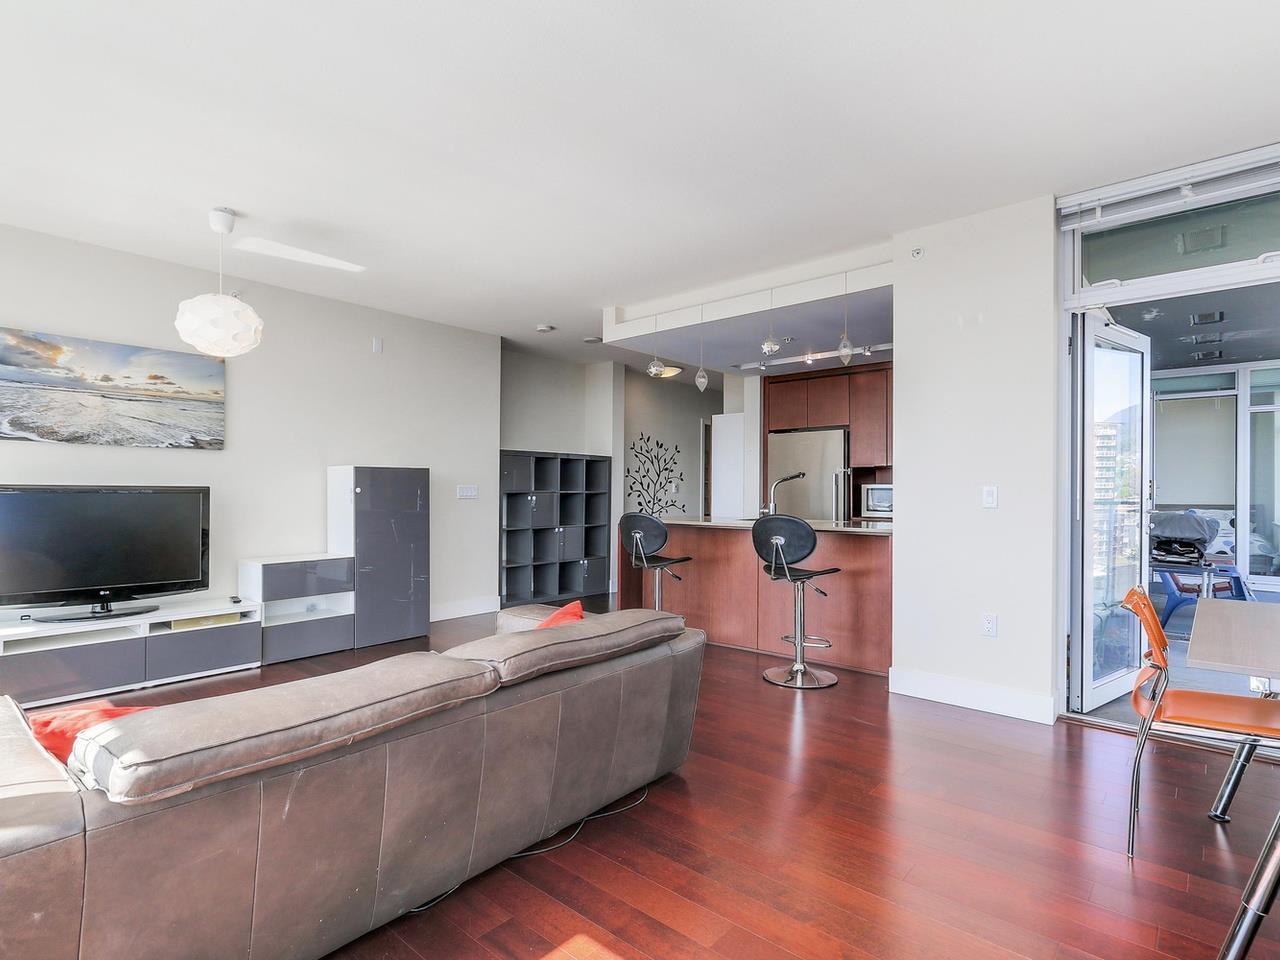 Condo Apartment at 1201 1320 CHESTERFIELD AVENUE, Unit 1201, North Vancouver, British Columbia. Image 9